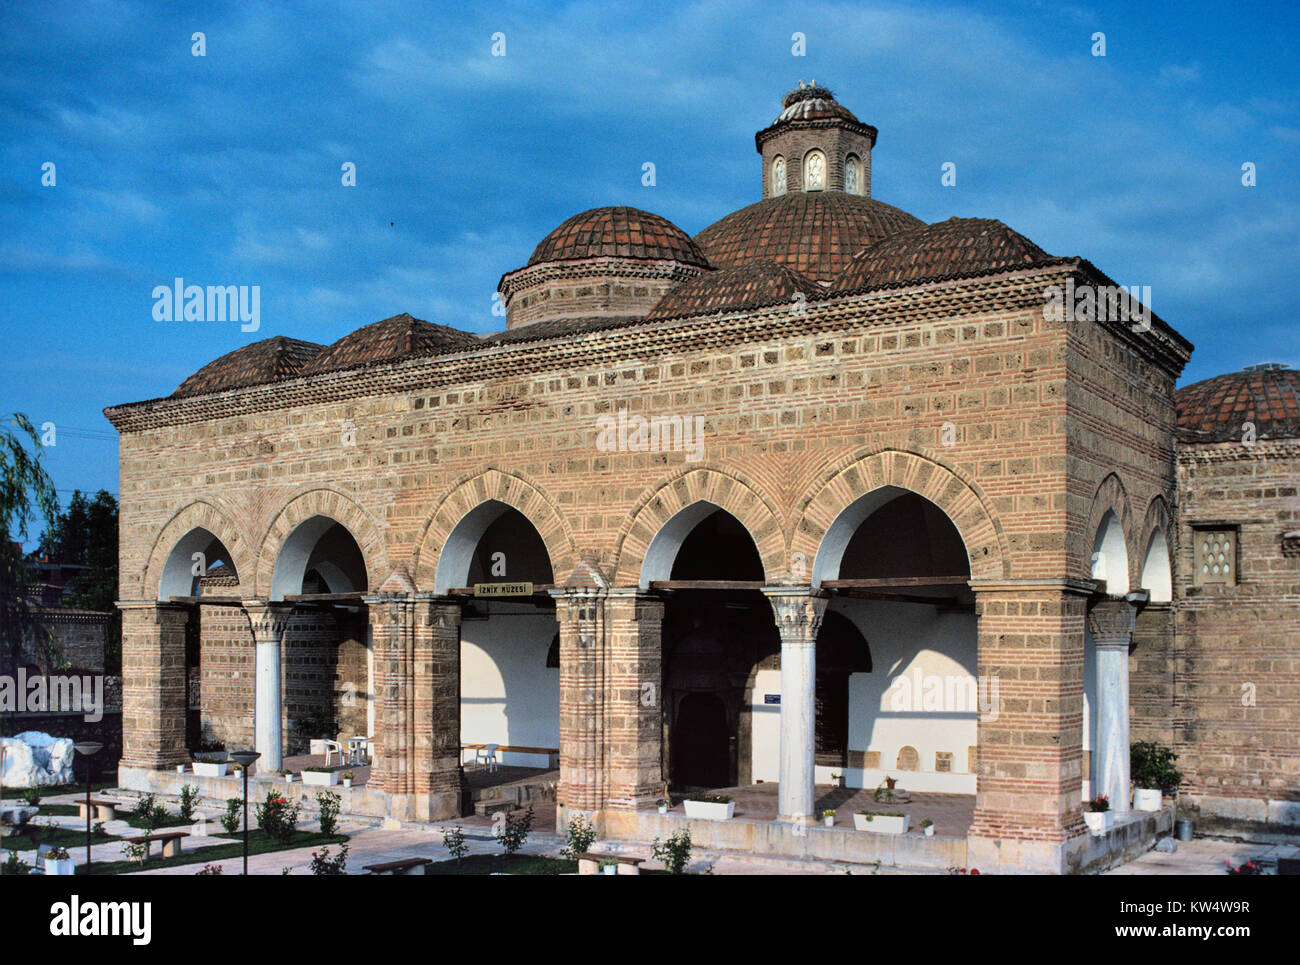 Nilufer Hatun Soup Kitchen, or Imaret, built in 1388, now a Museum, Iznik,  Turkey